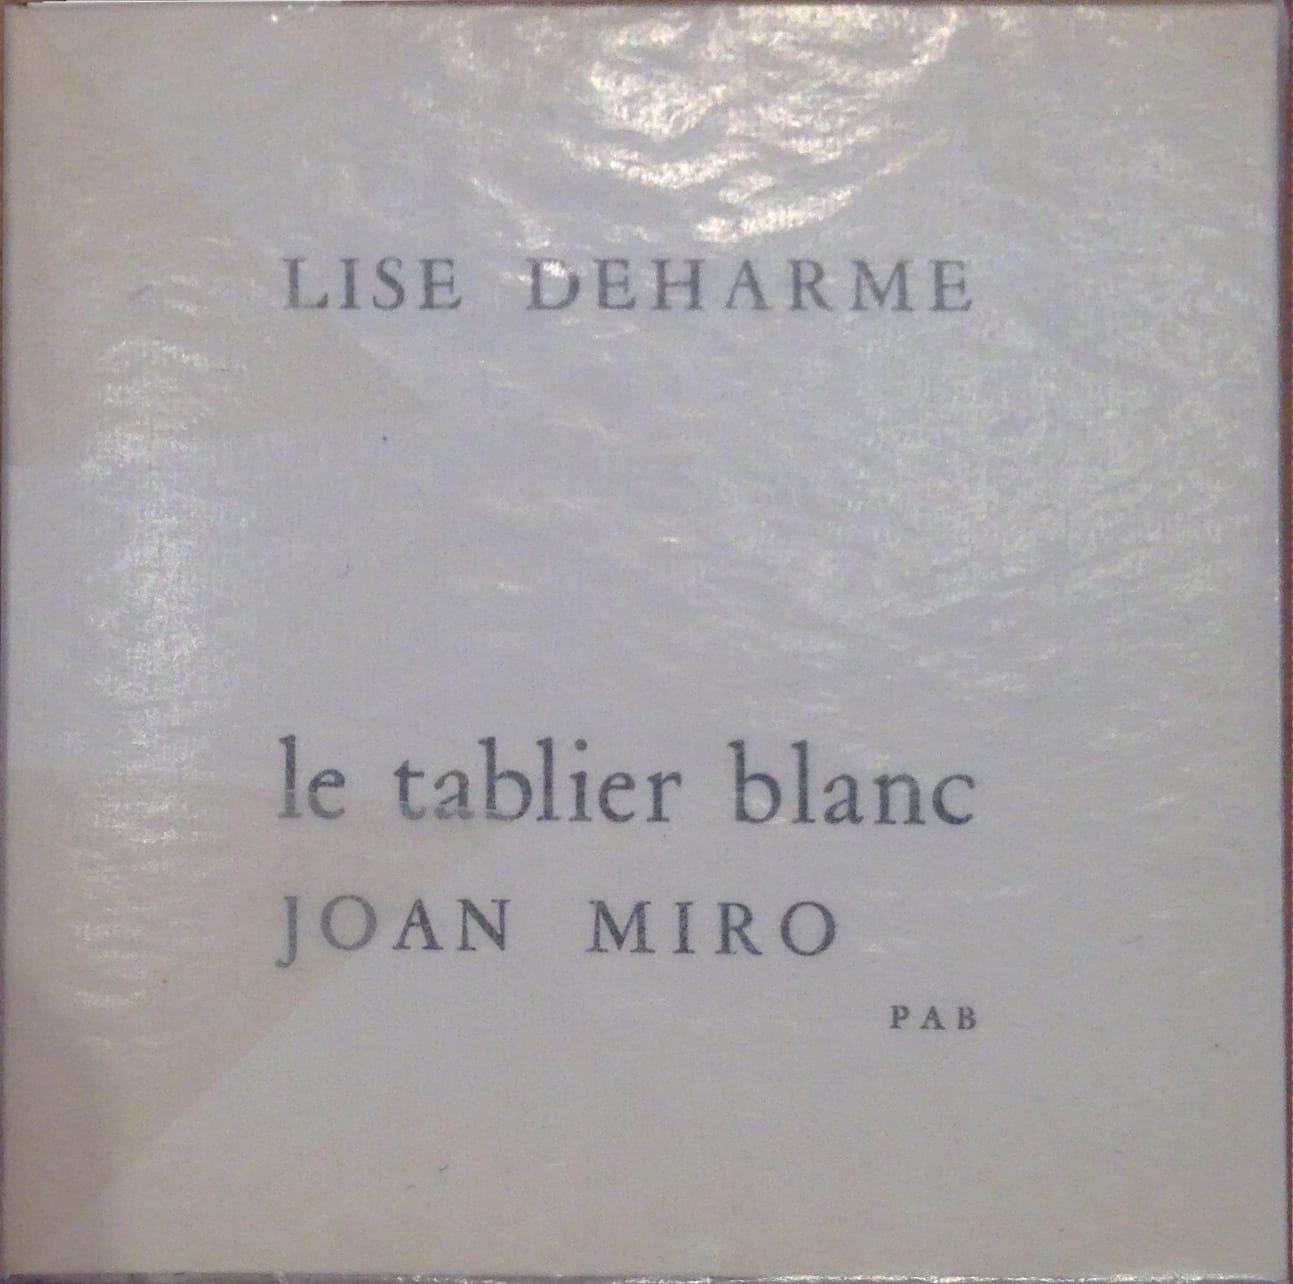 Lise Deharme, <br /><em>LeTablierblanc</em>, 1958